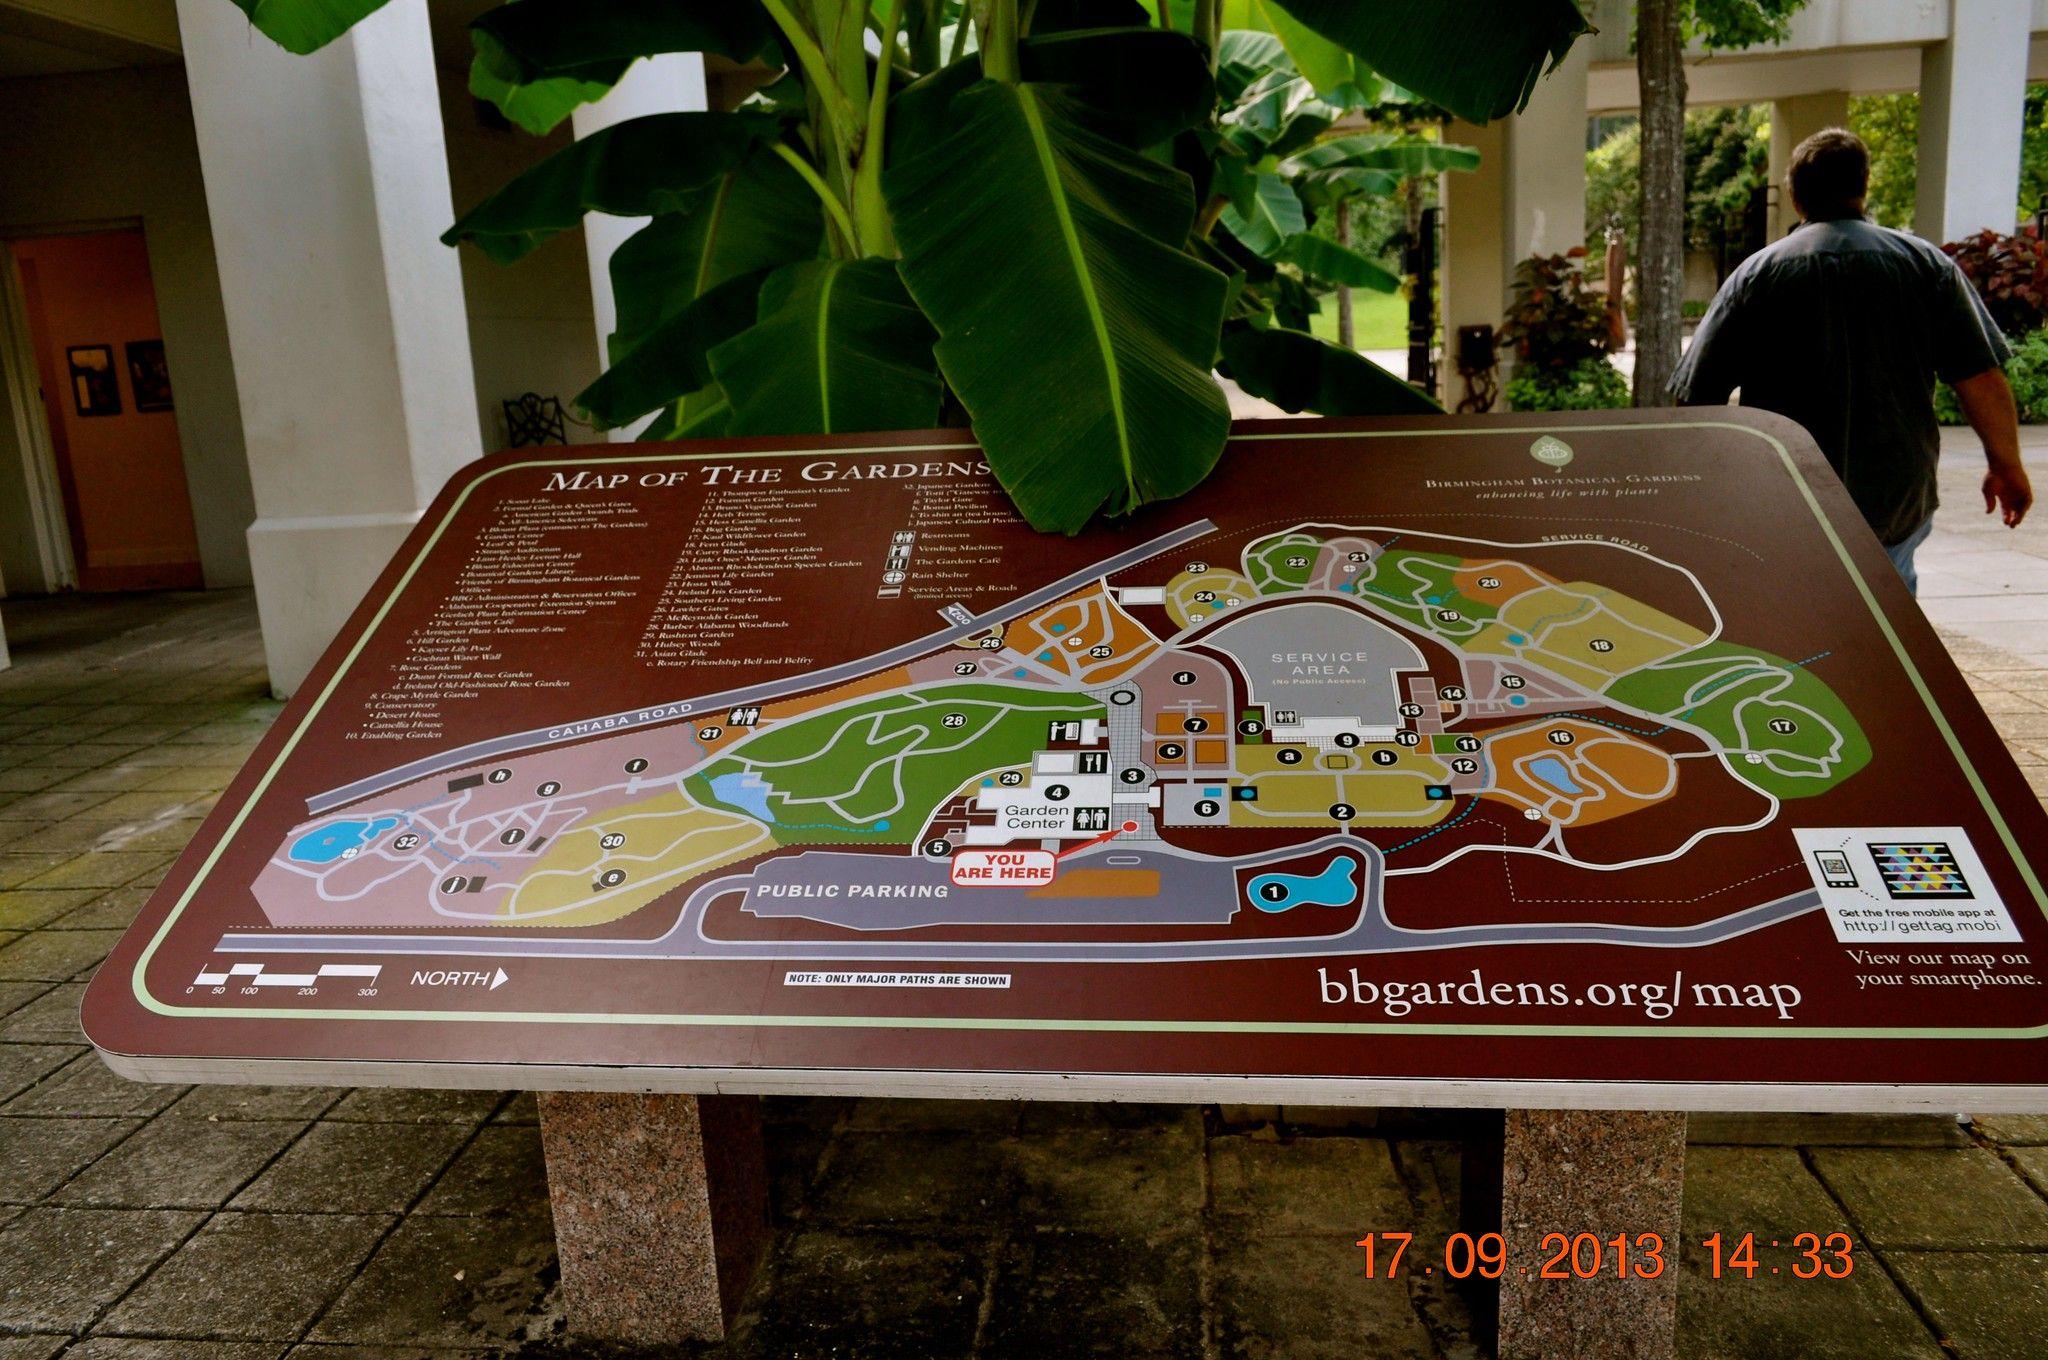 5417373eff064719e5a73bdc1a56a7d3 - Birmingham Botanical Gardens Lantern Festival 2019